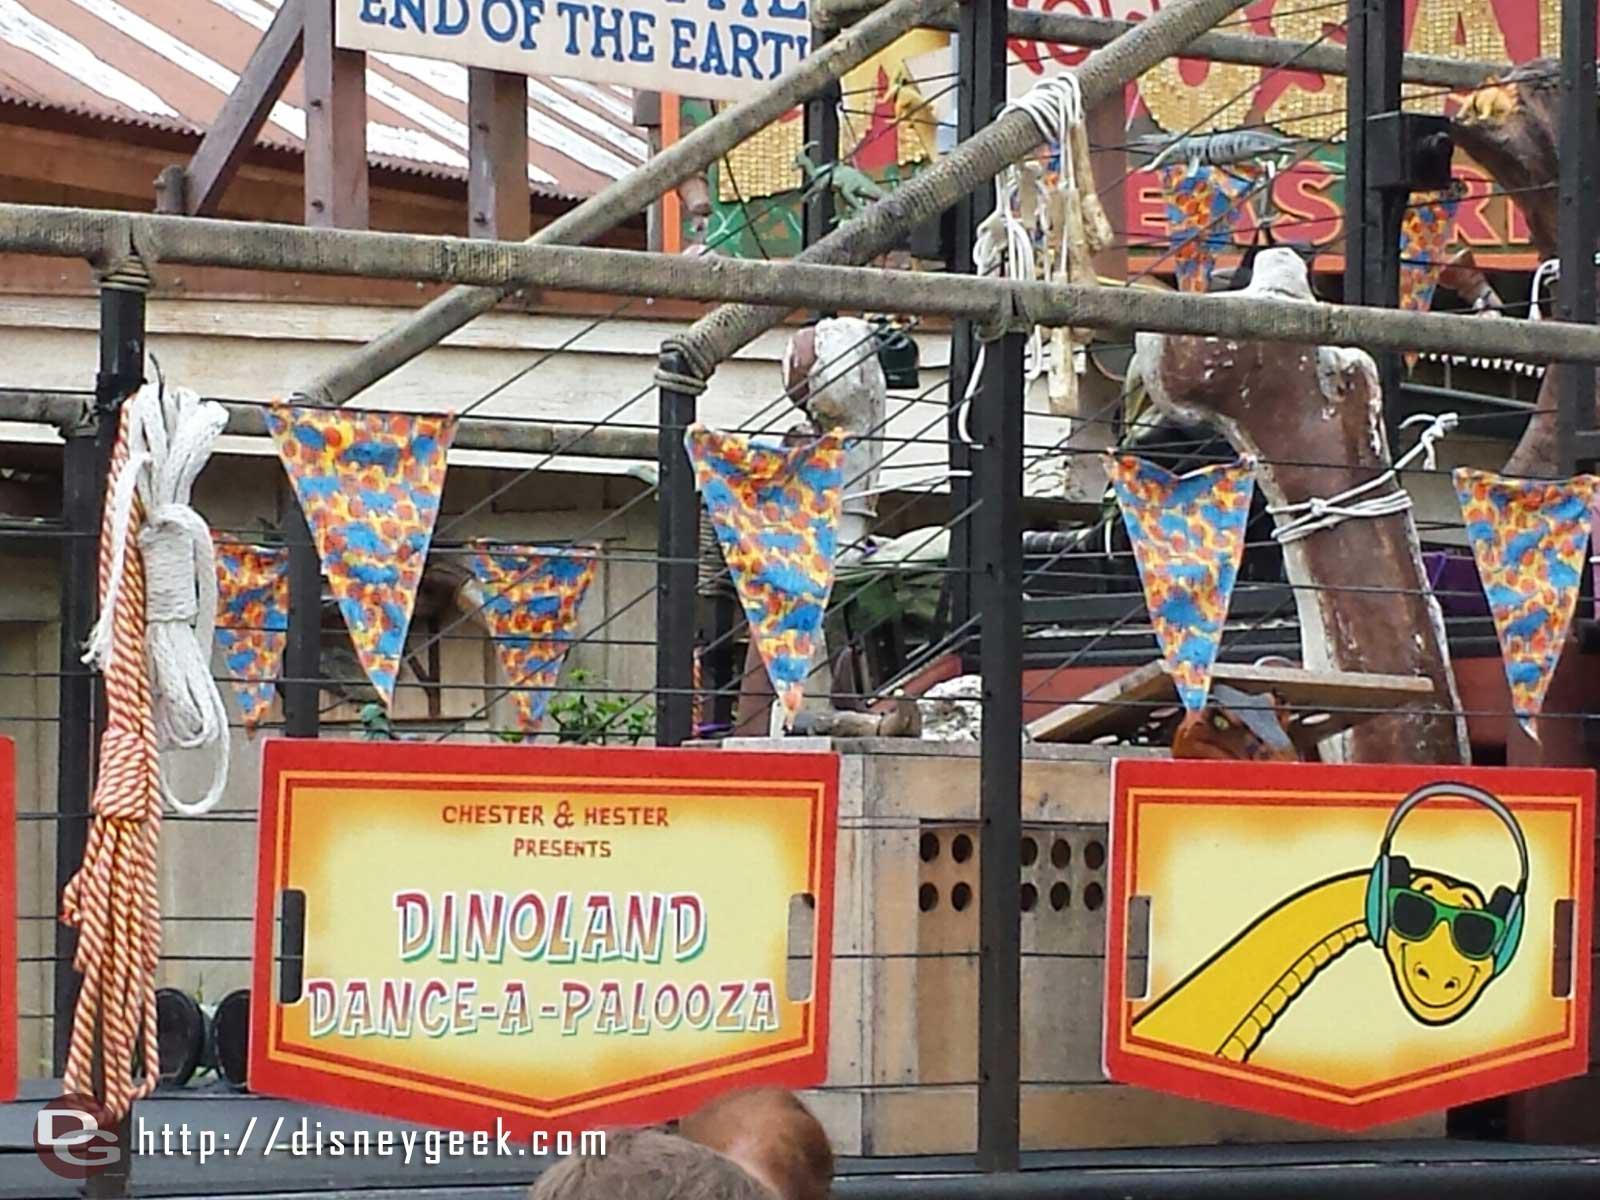 Dinoland Dance-a-Palooza signage – Disney's Animal Kingdom